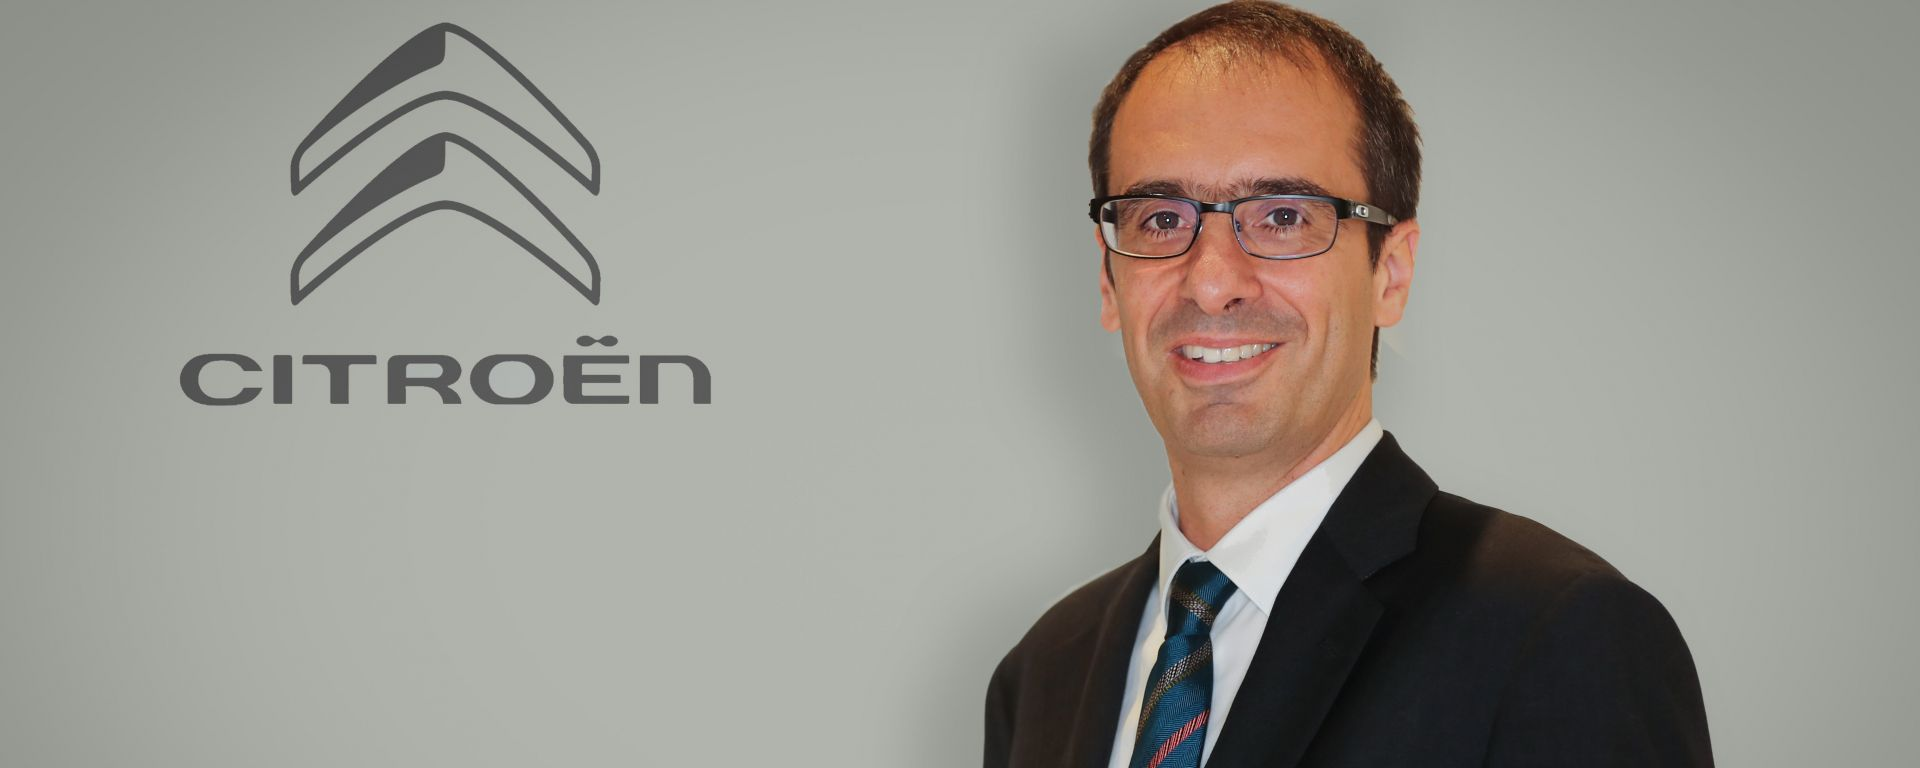 Mathieu Ammassari, nuovo direttore vendite per Citroën Italia